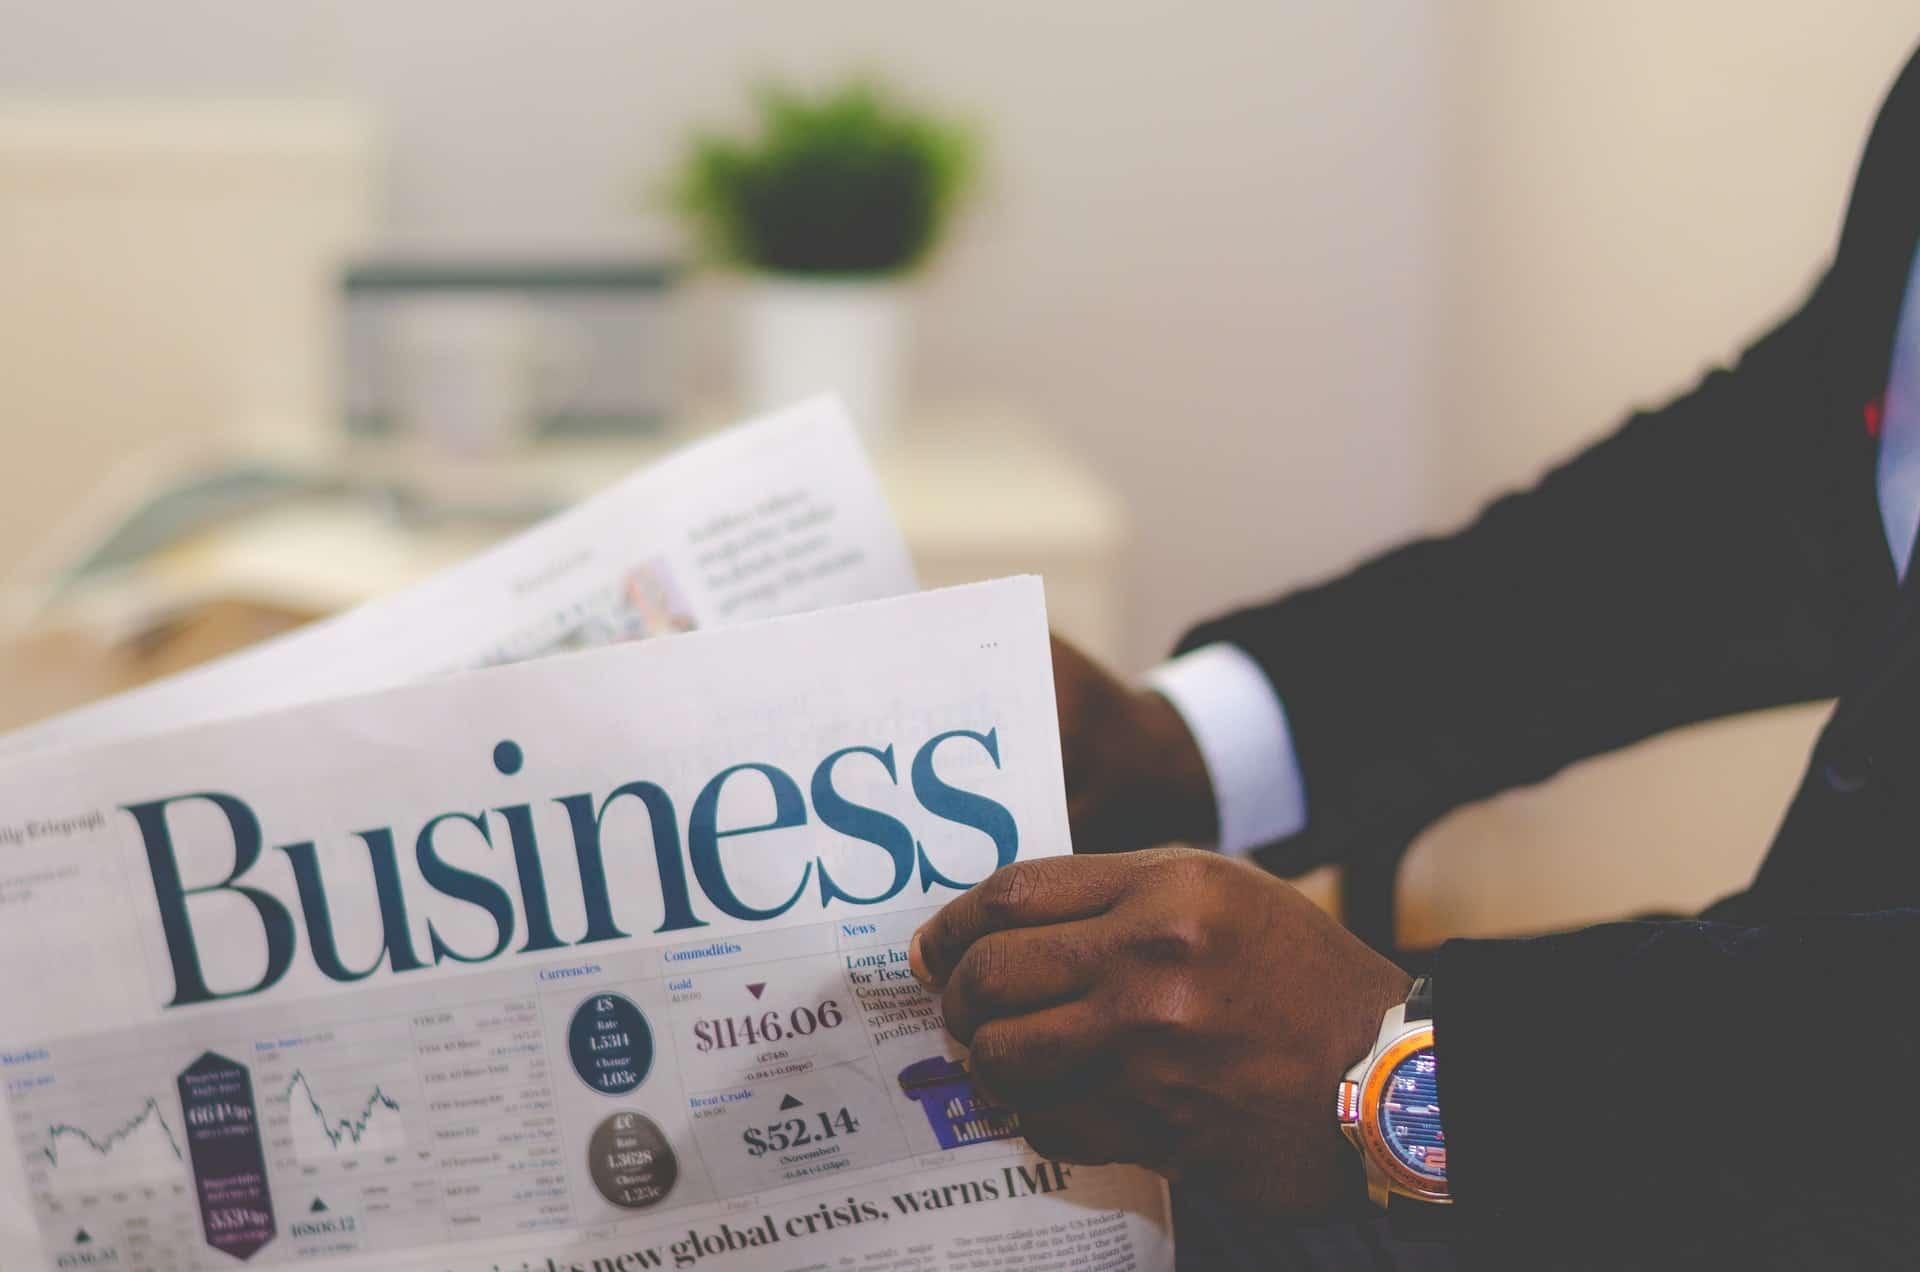 Financial News APIa